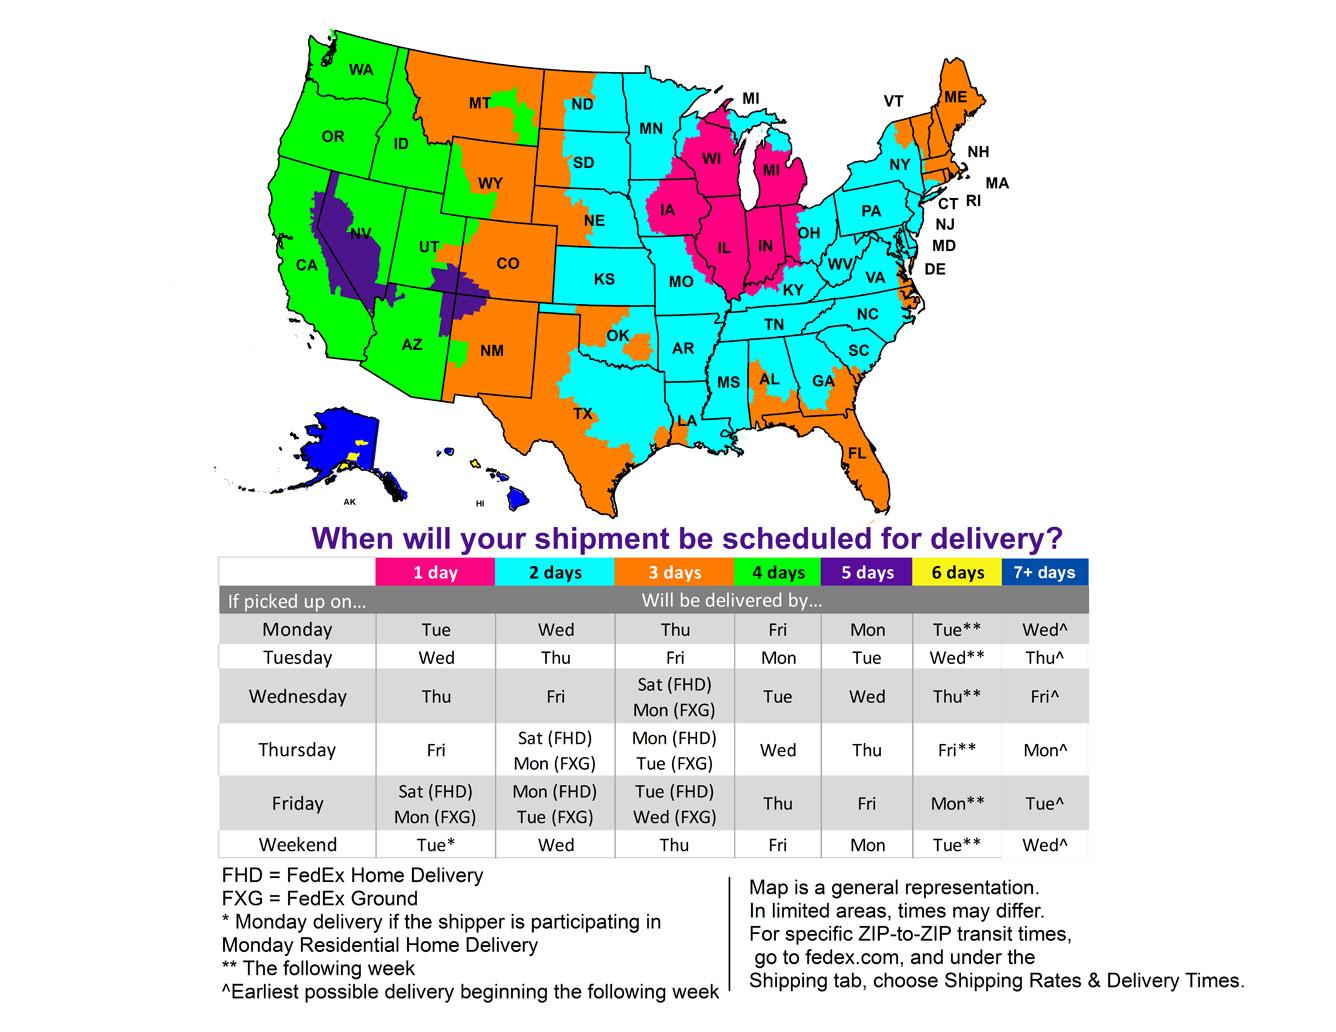 FedEx Shipping Zones